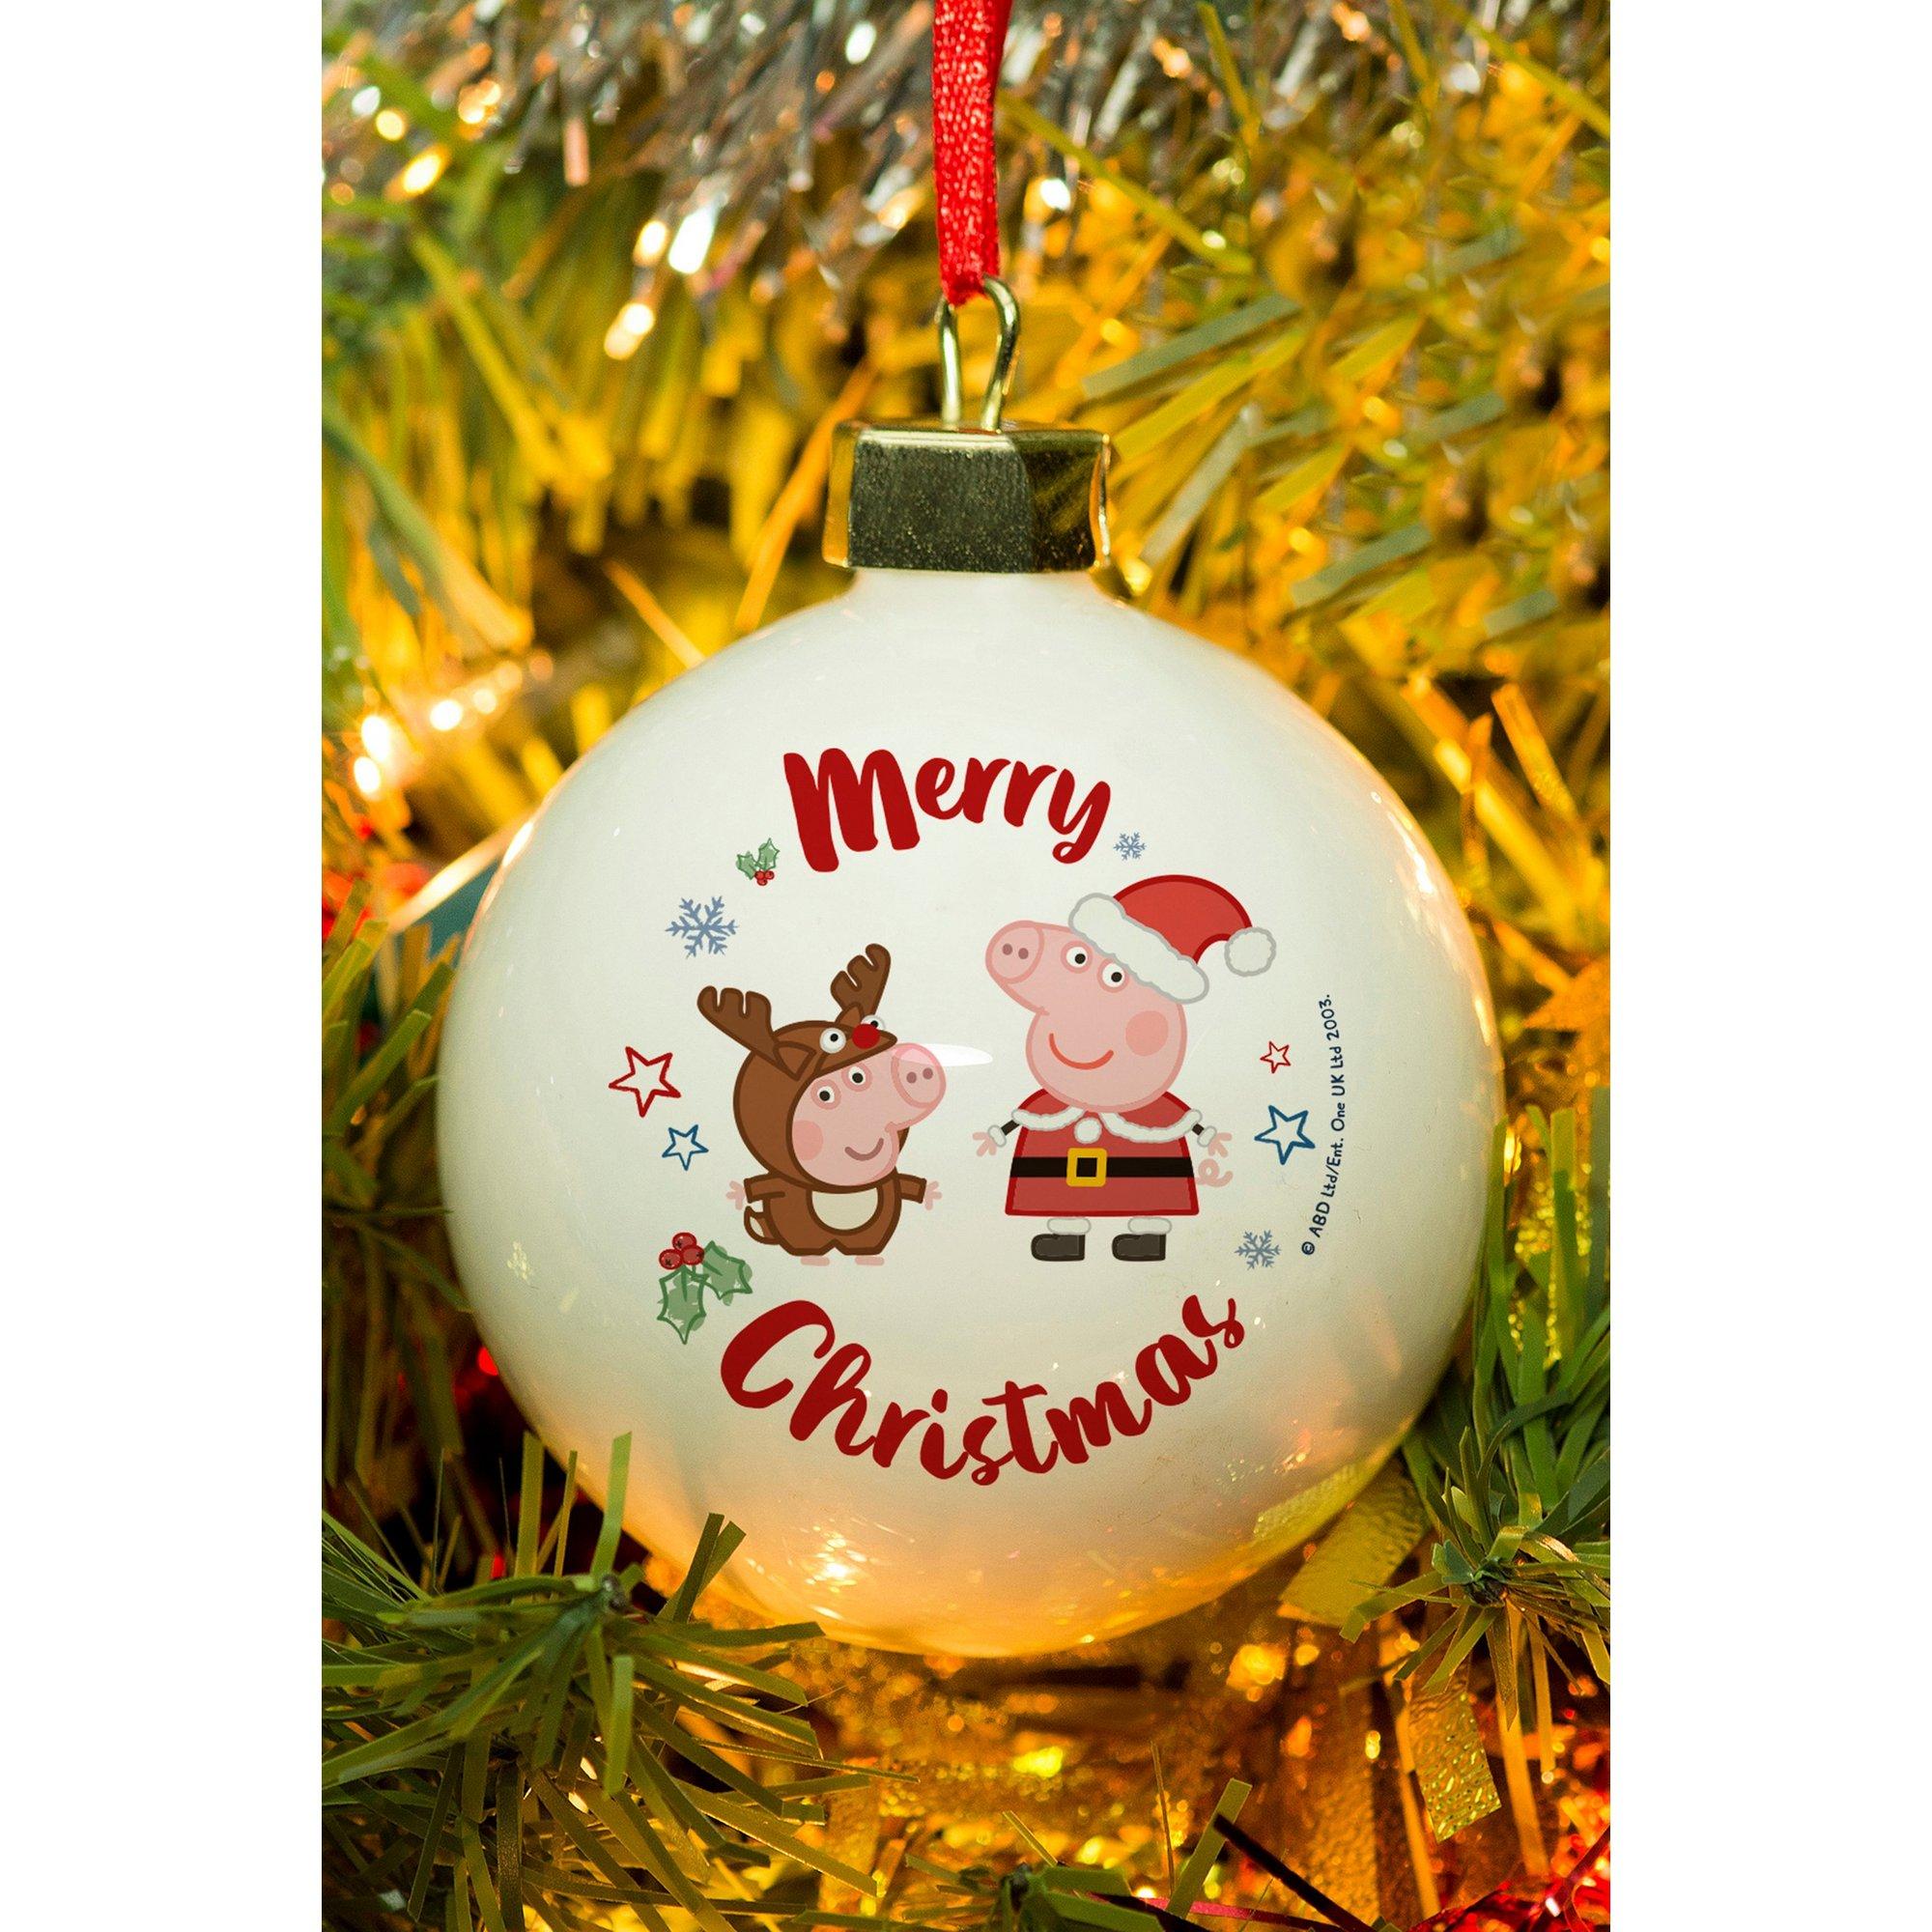 Image of Personalised Peppa Pig and George Pig Christmas Bauble